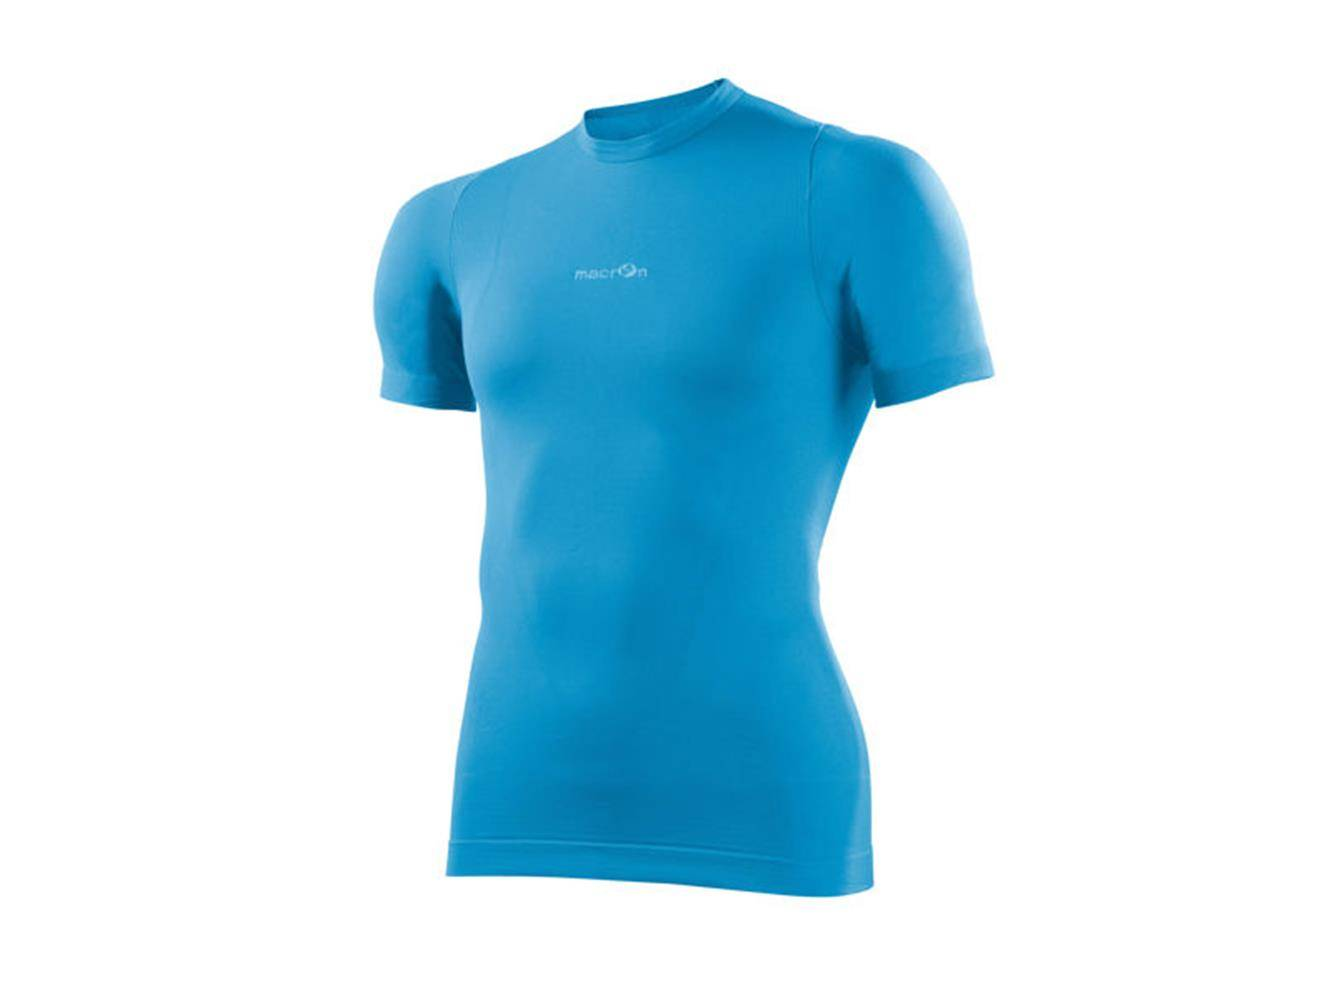 Macron Maglia Uomo Underwear Macron Alpha Shirt Short Sleeves